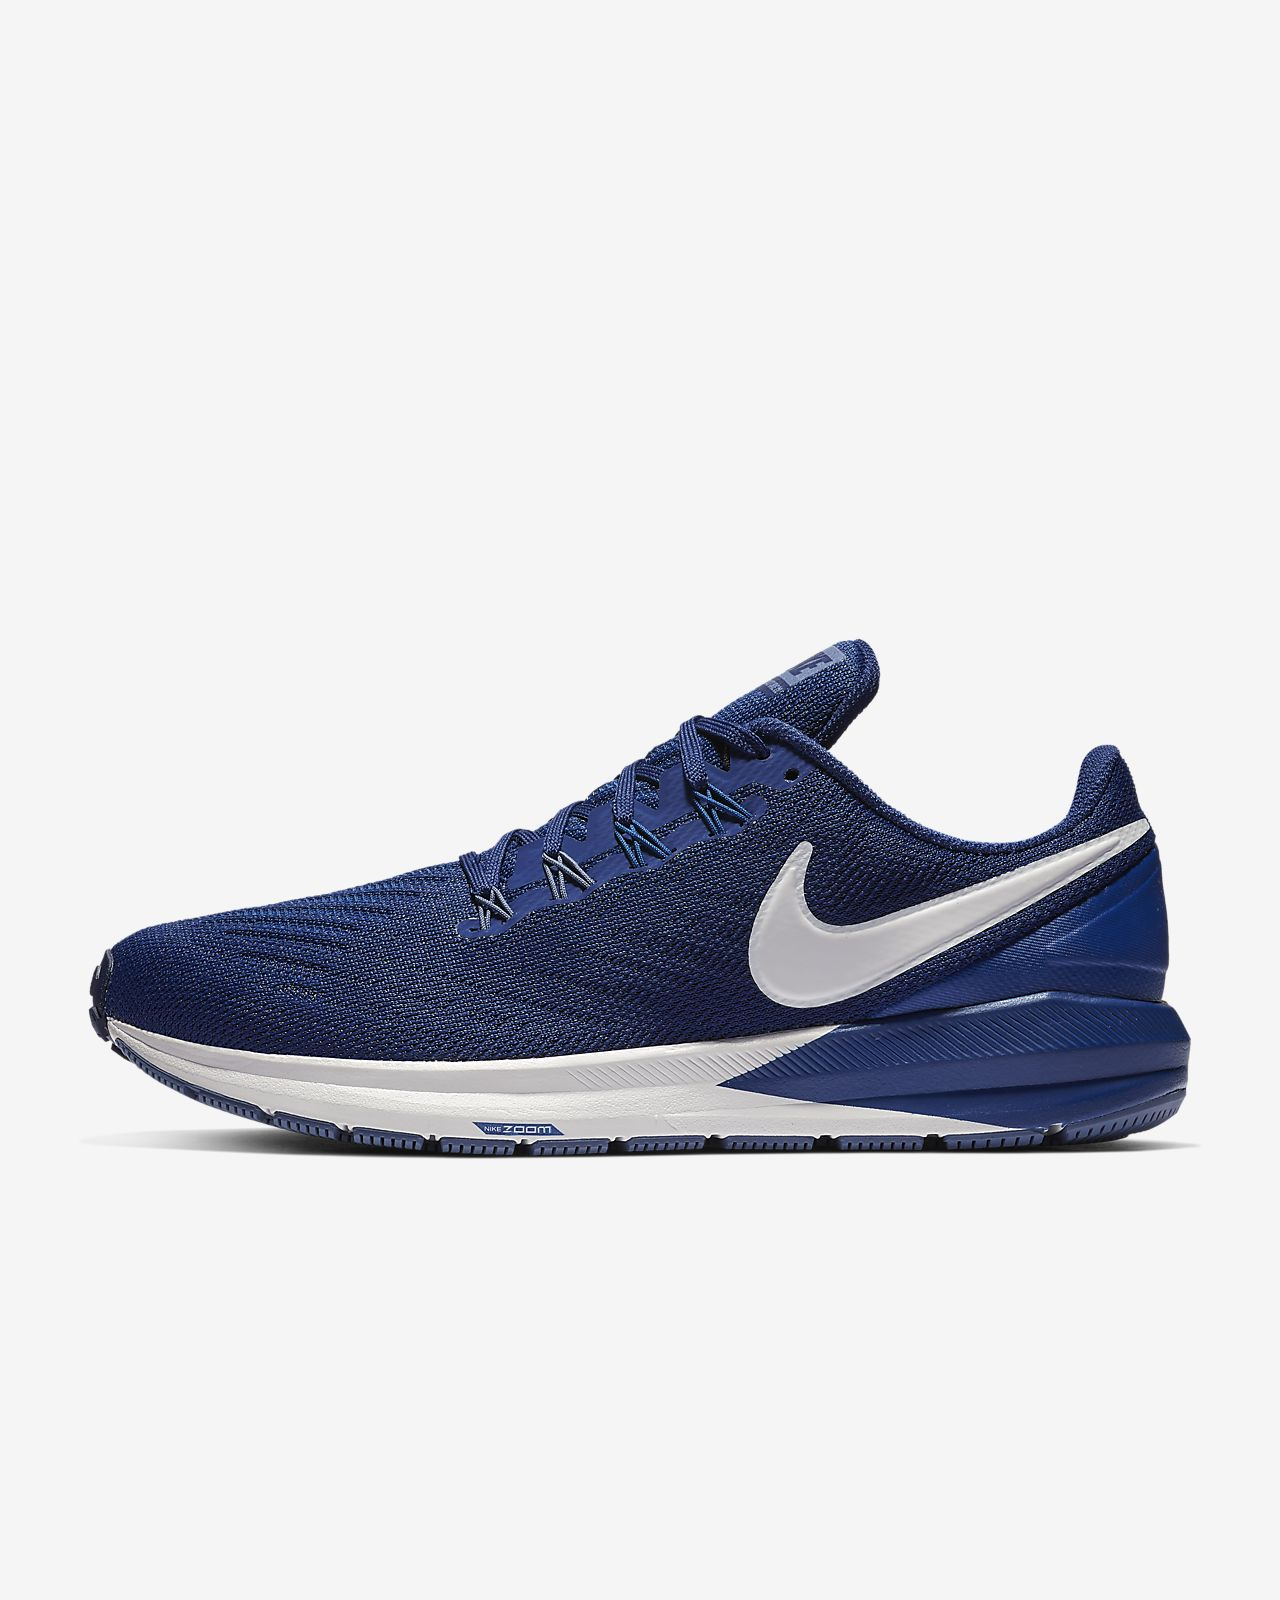 Nike Air Zoom Structure 22 Men's Running Shoe (Narrow)